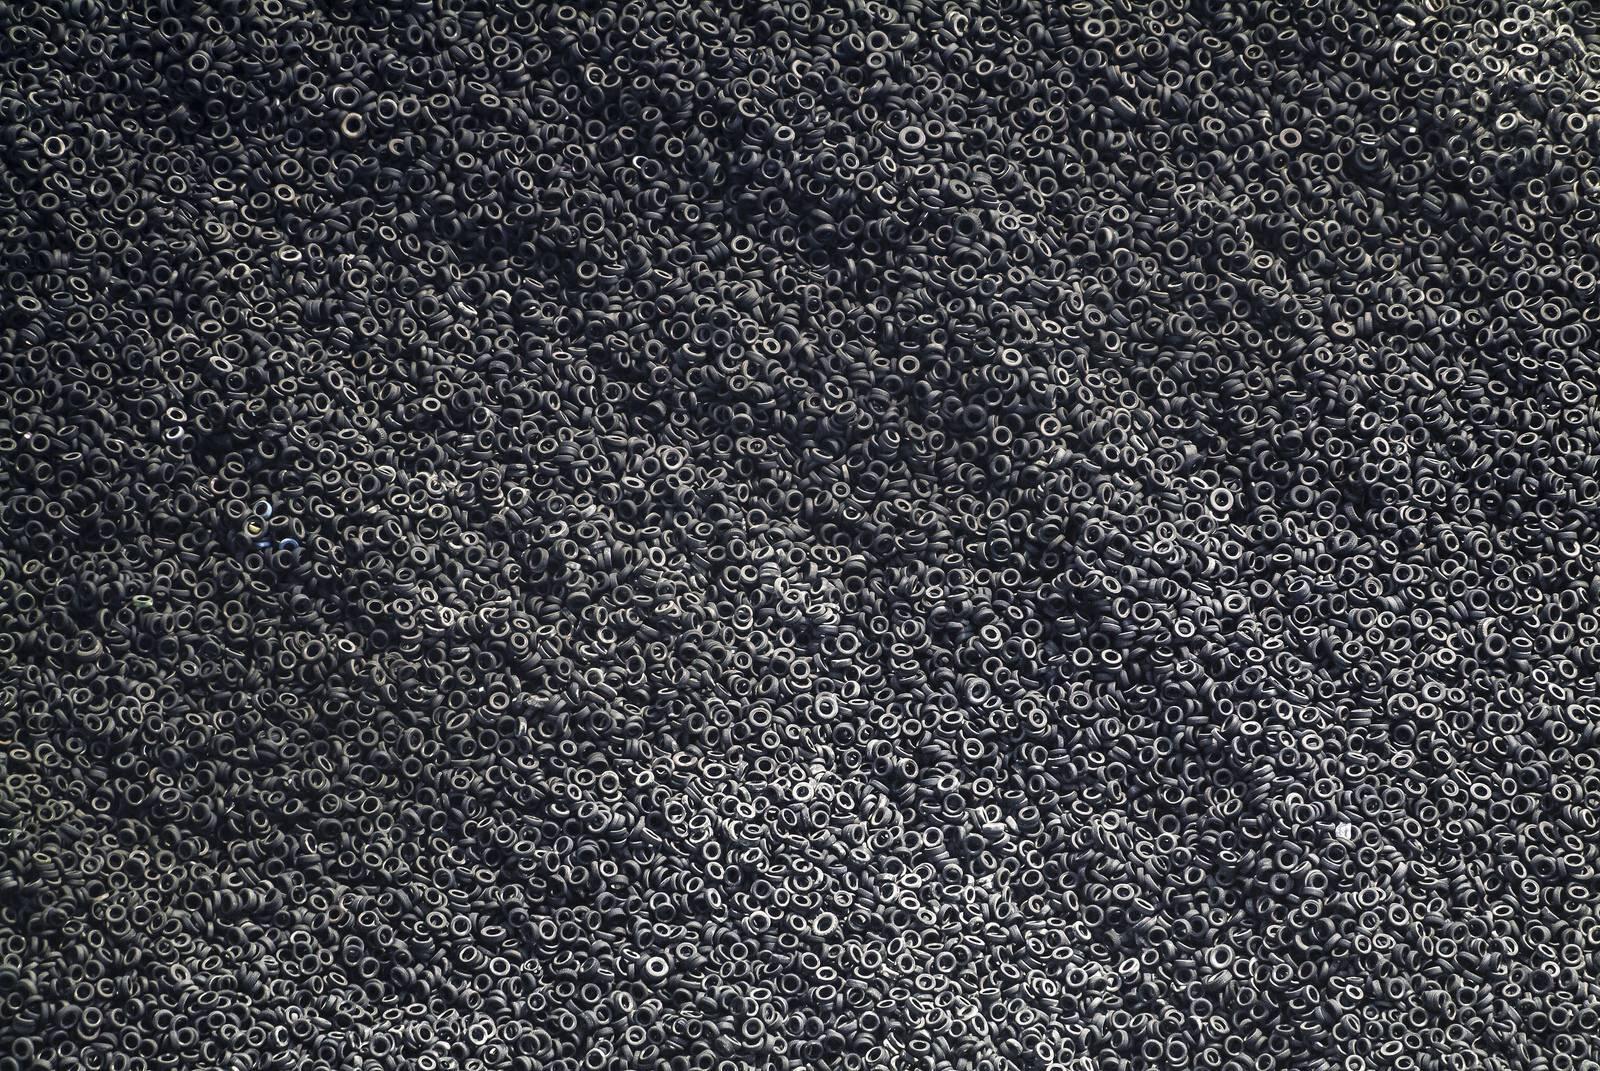 Aerial view of a scrap tire dumpyard. http://t.co/mI8C4v3xkY